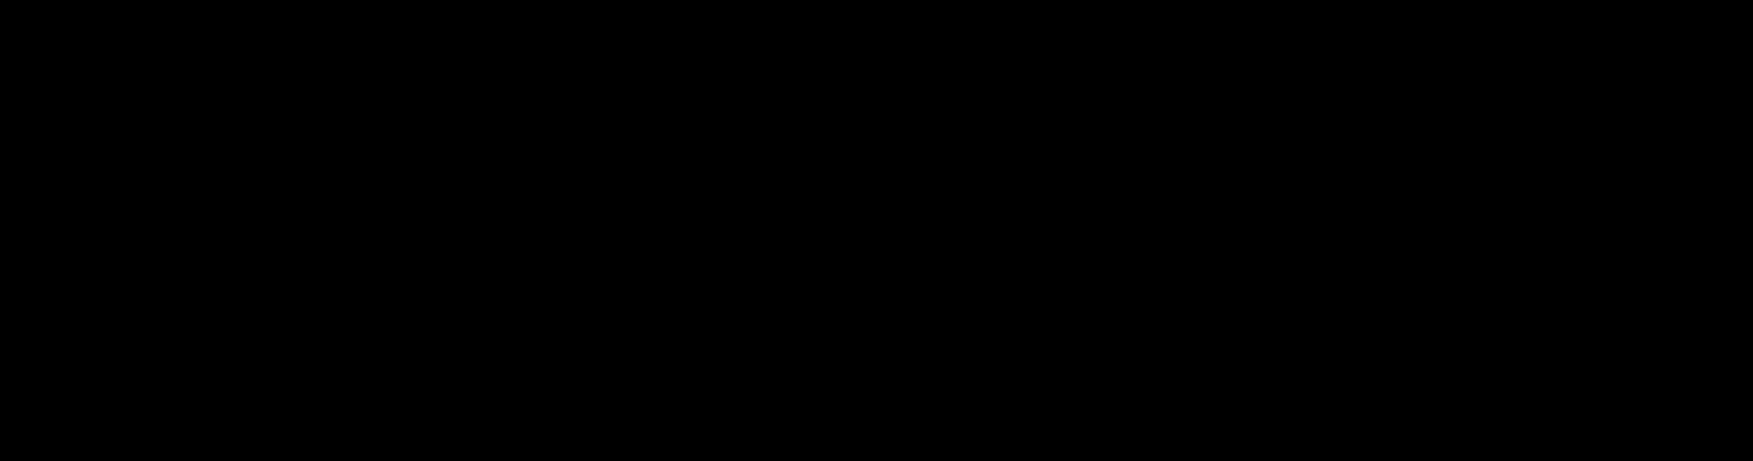 heyllo-a01